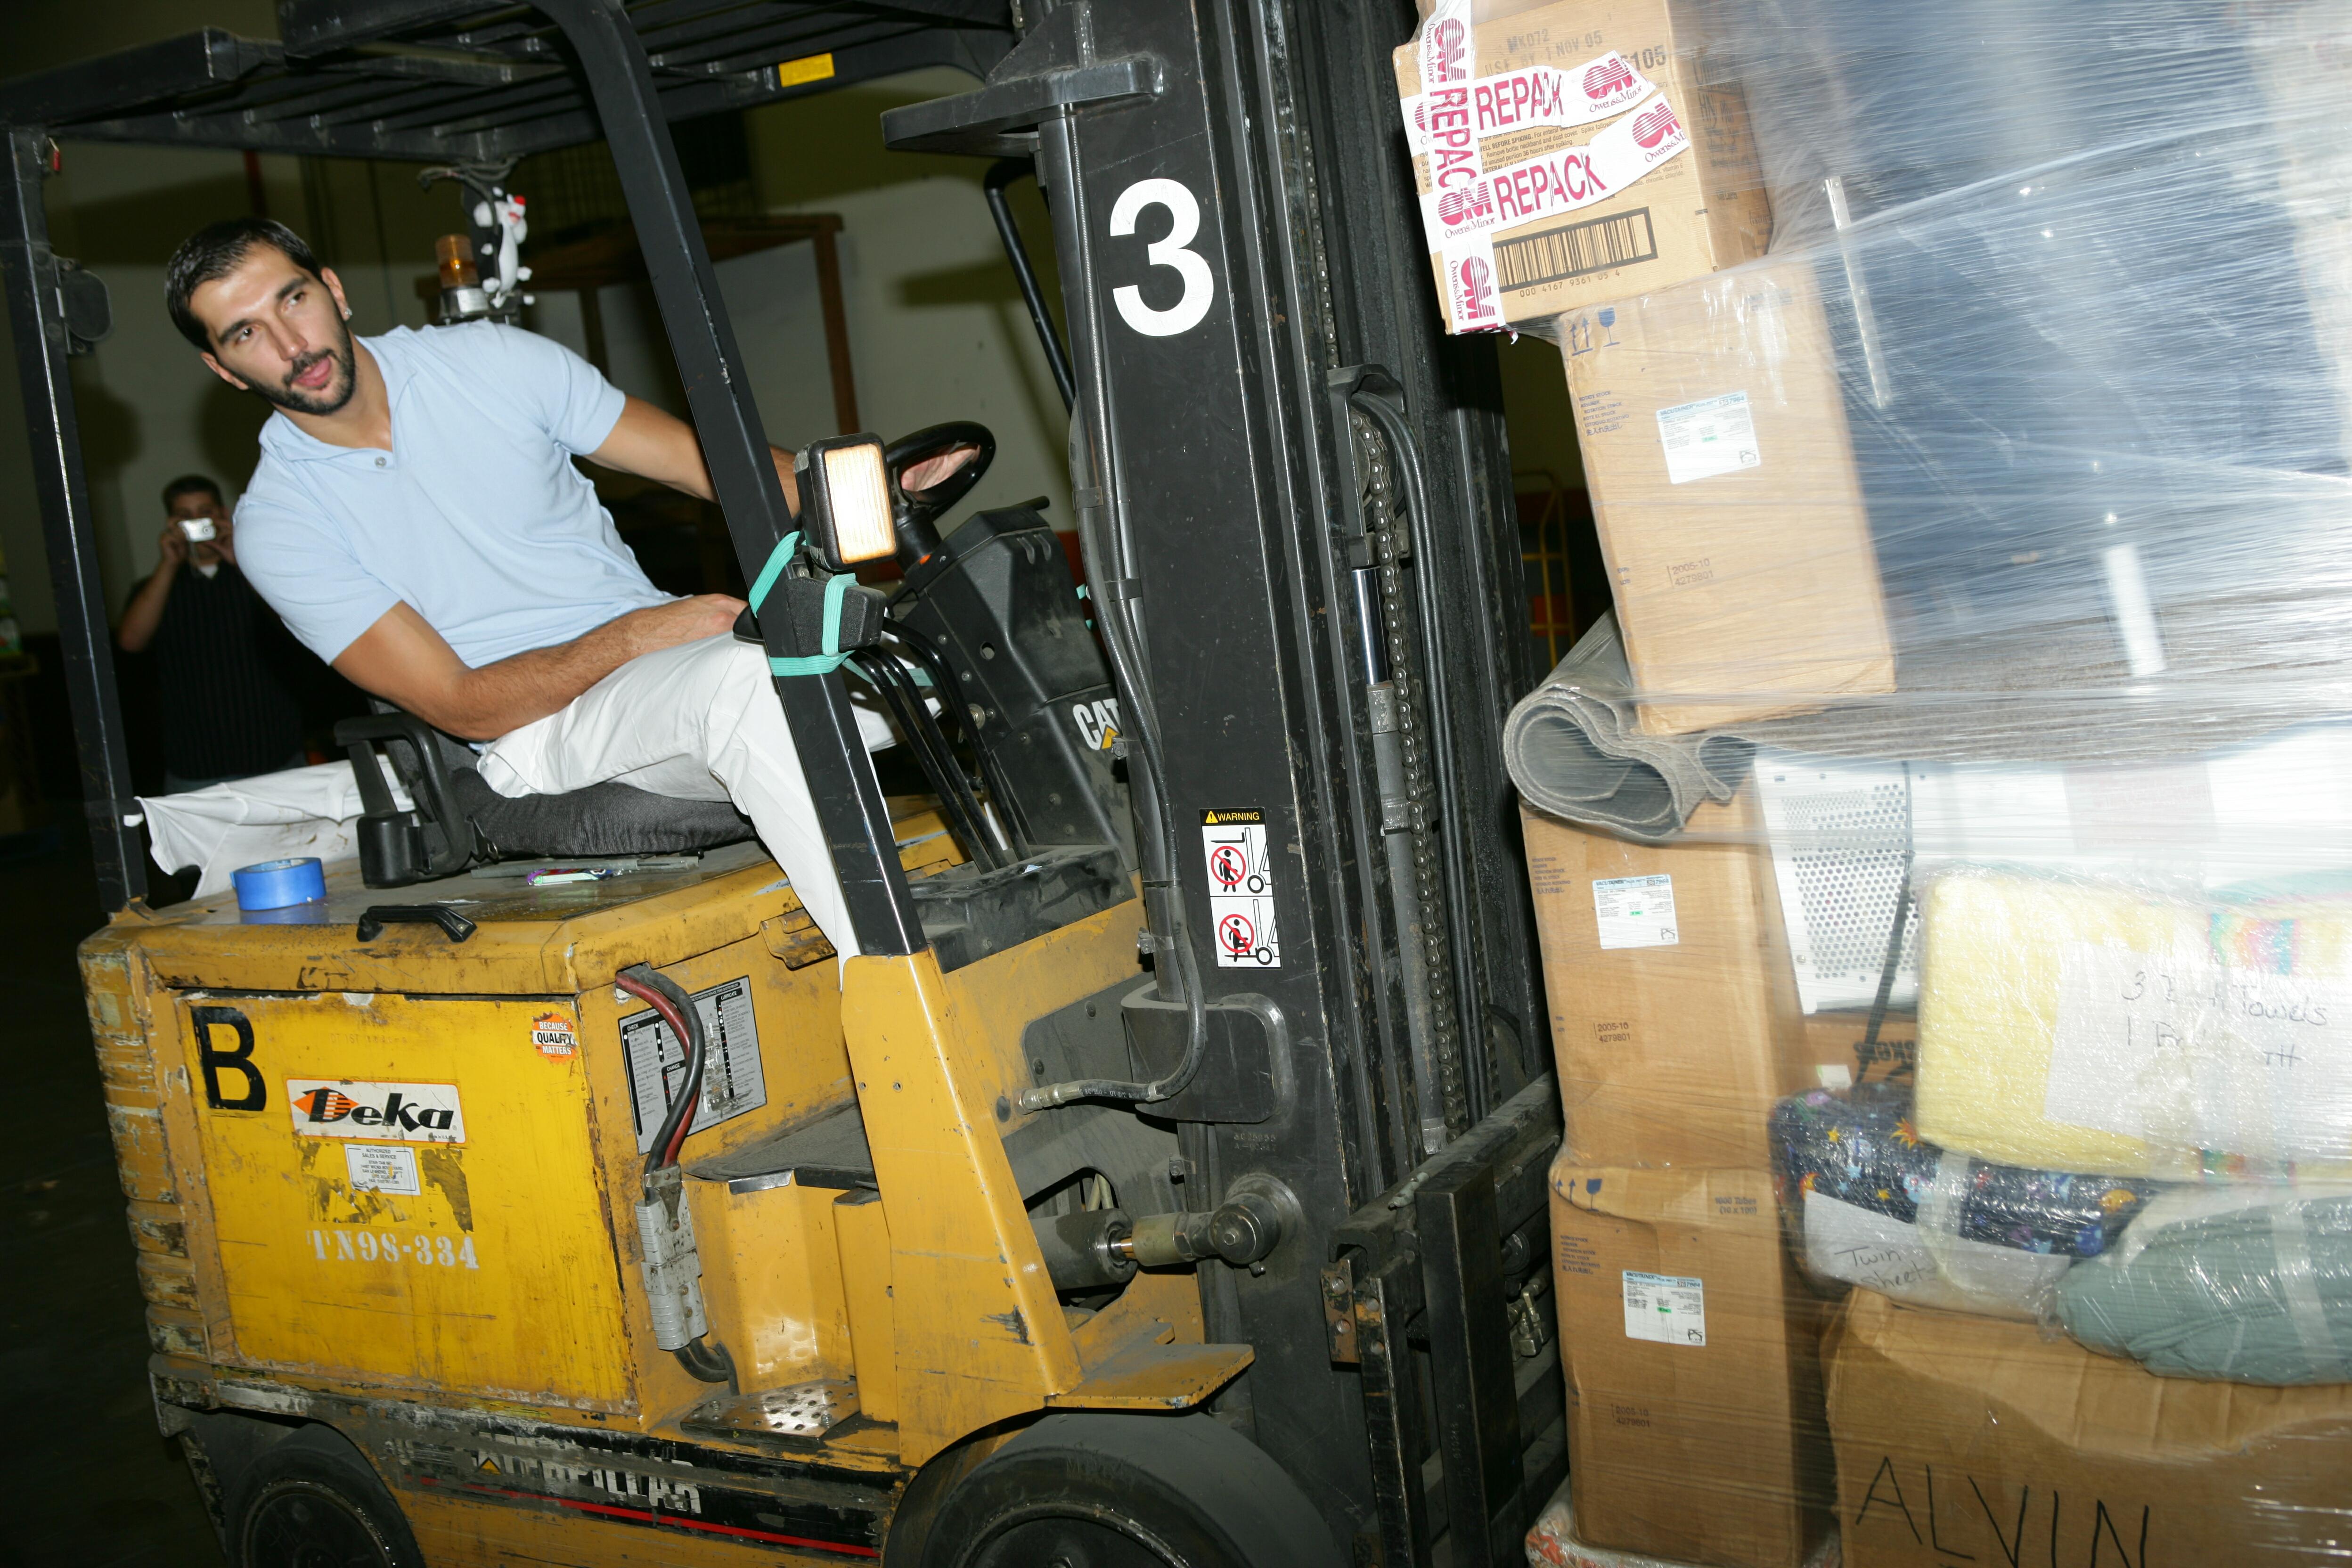 Peja Stojakovic Hurricane Katrina Relief